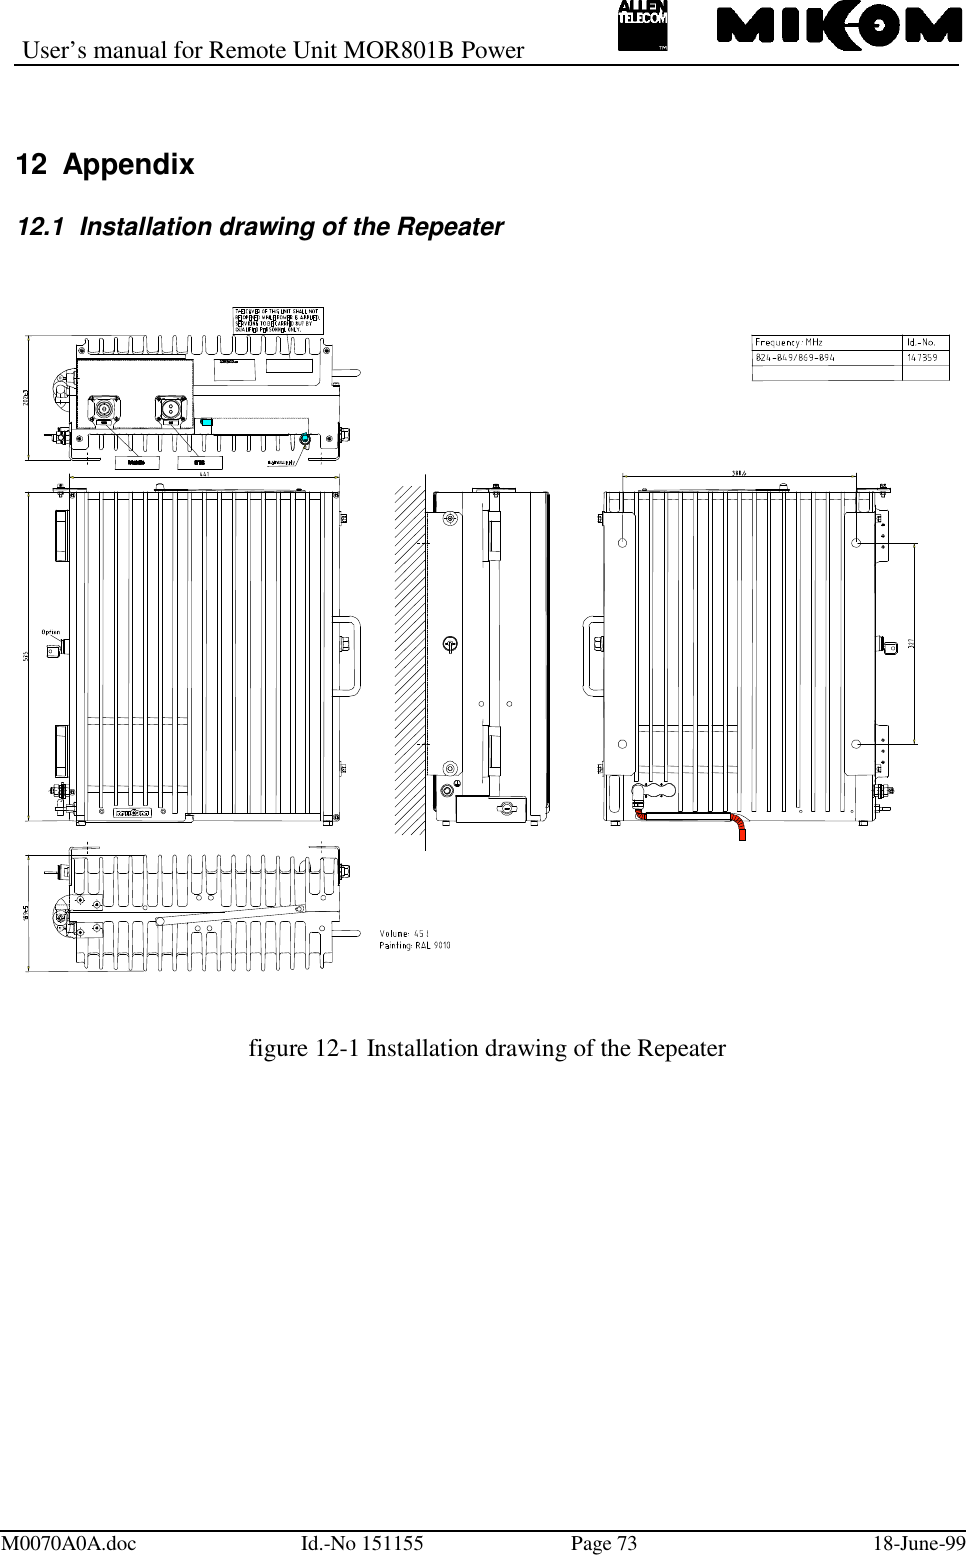 Andrew Wireless Innovations Group RPT-MOR801 Cellular